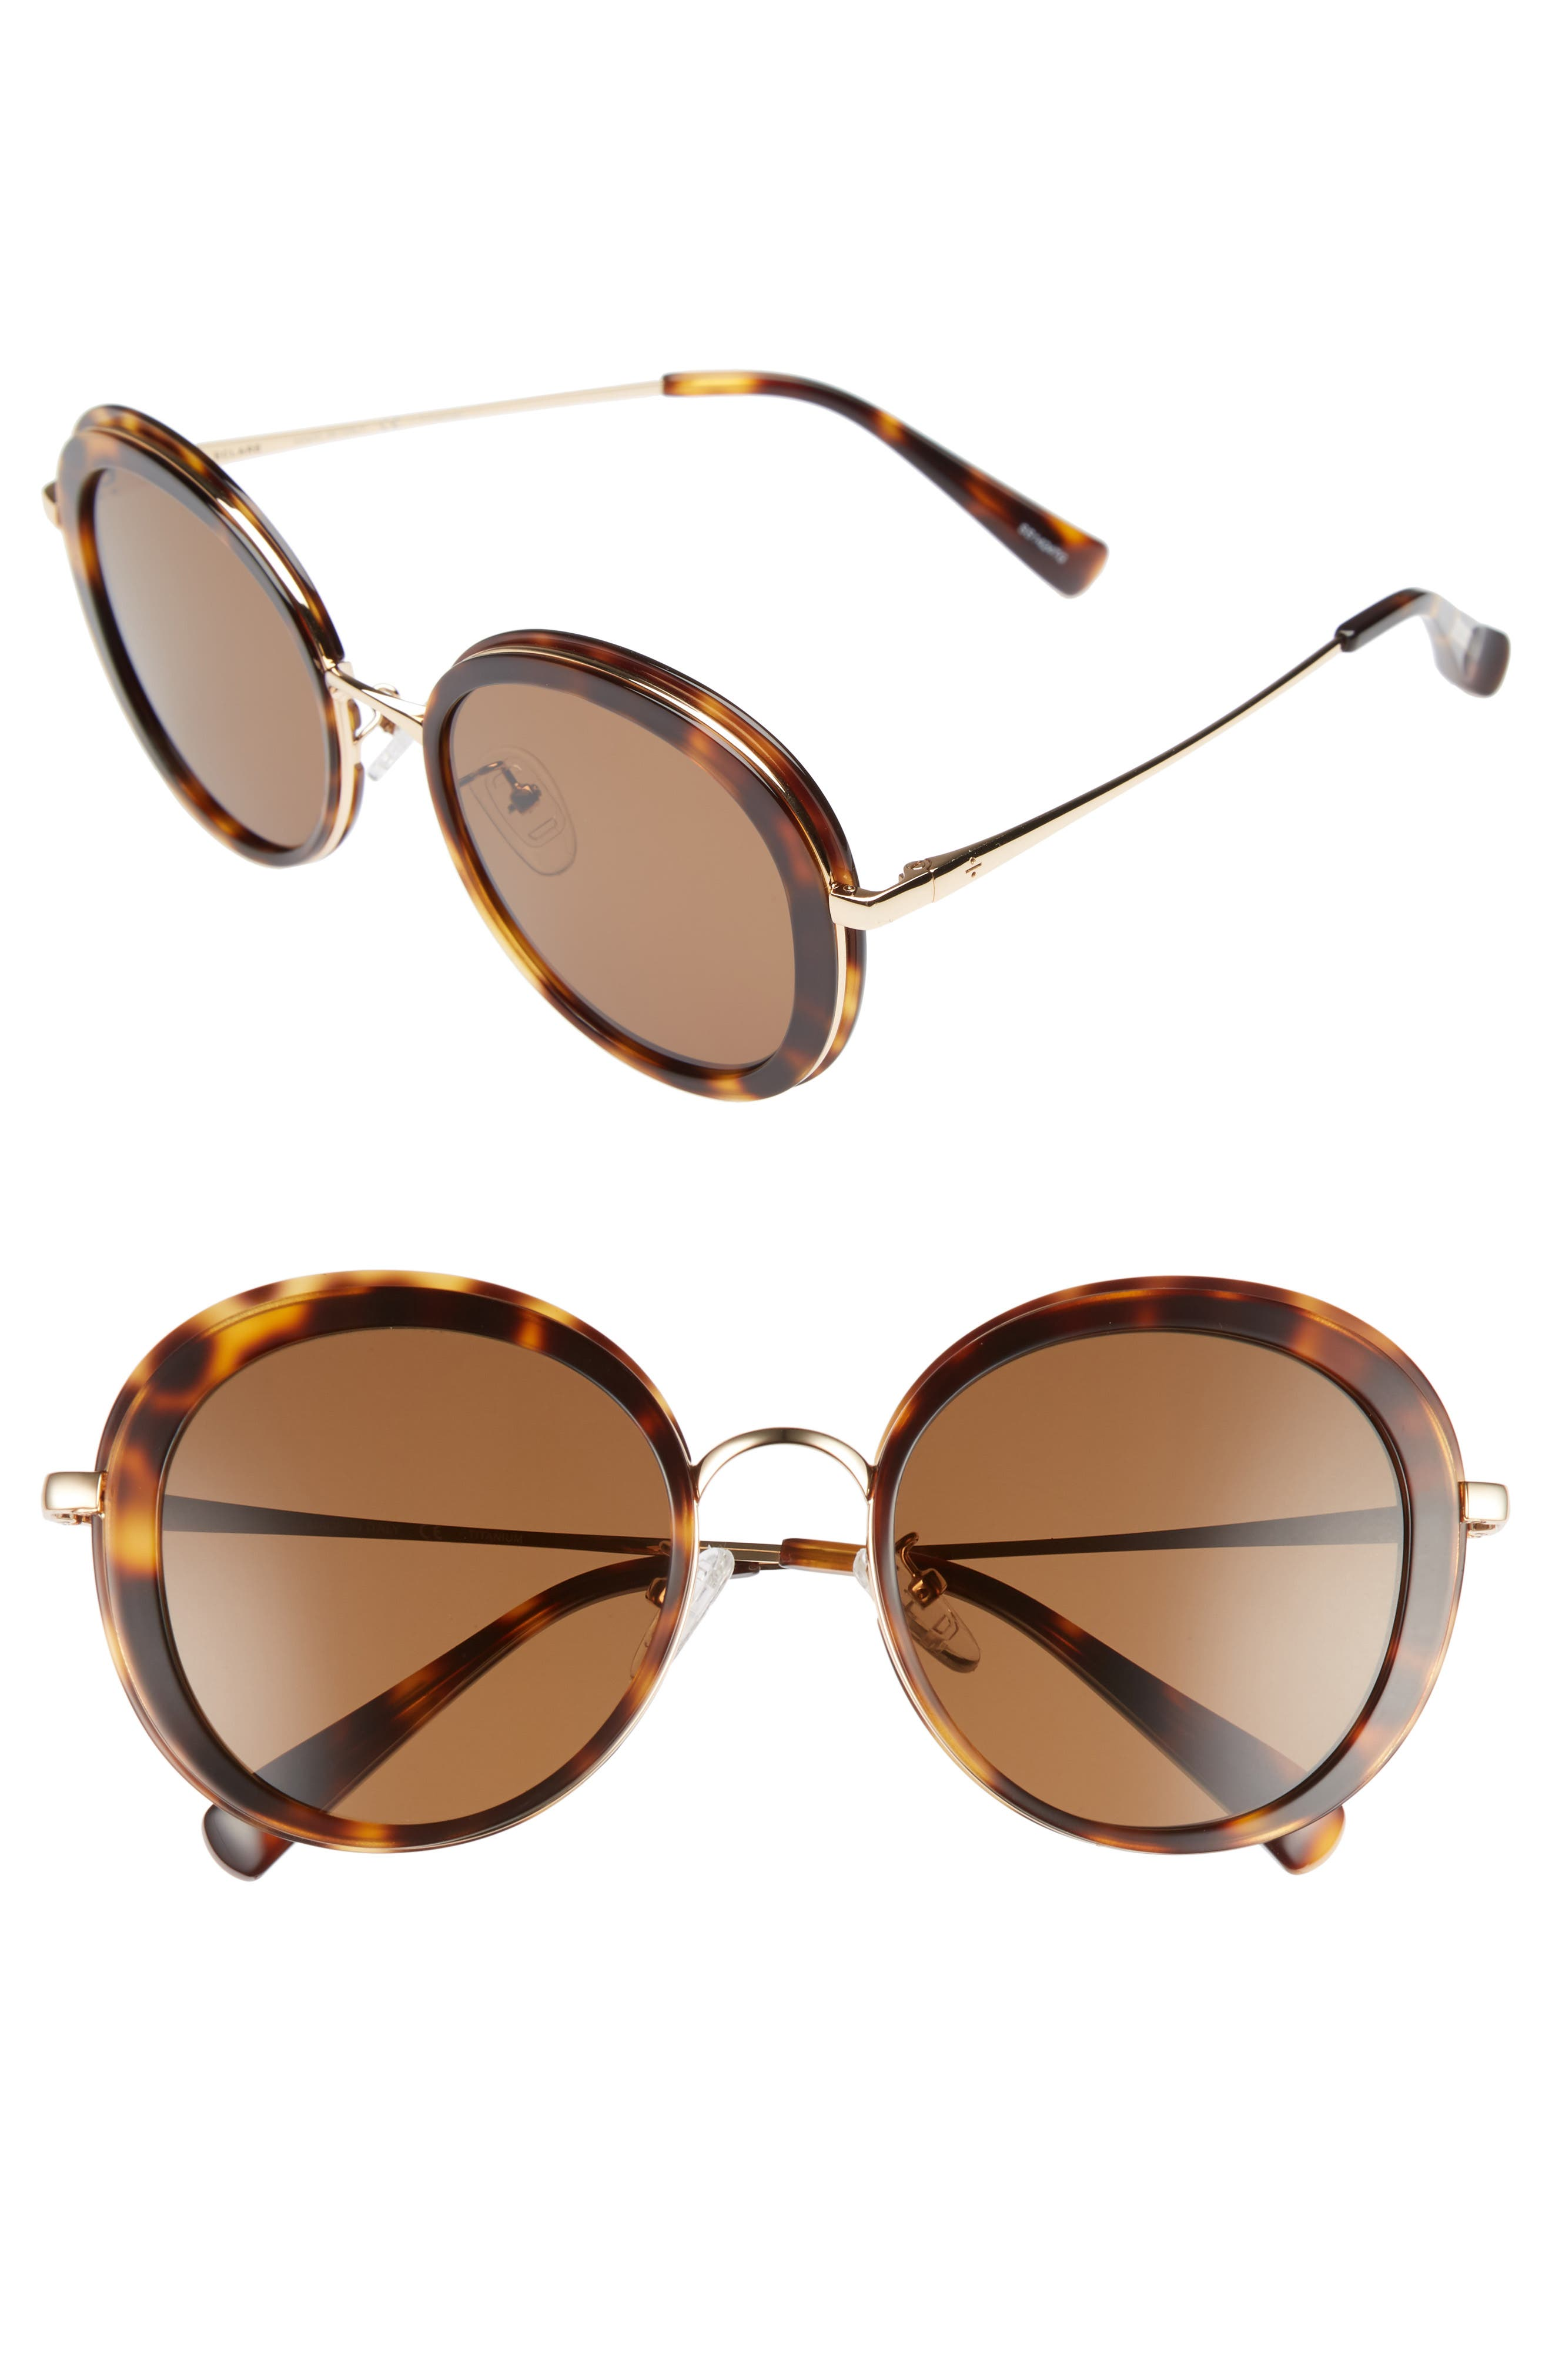 BLANC & ECLARE Portofino 54mm Polarized Sunglasses,                             Main thumbnail 1, color,                             Tortoise/ Gold/ Solid Brown